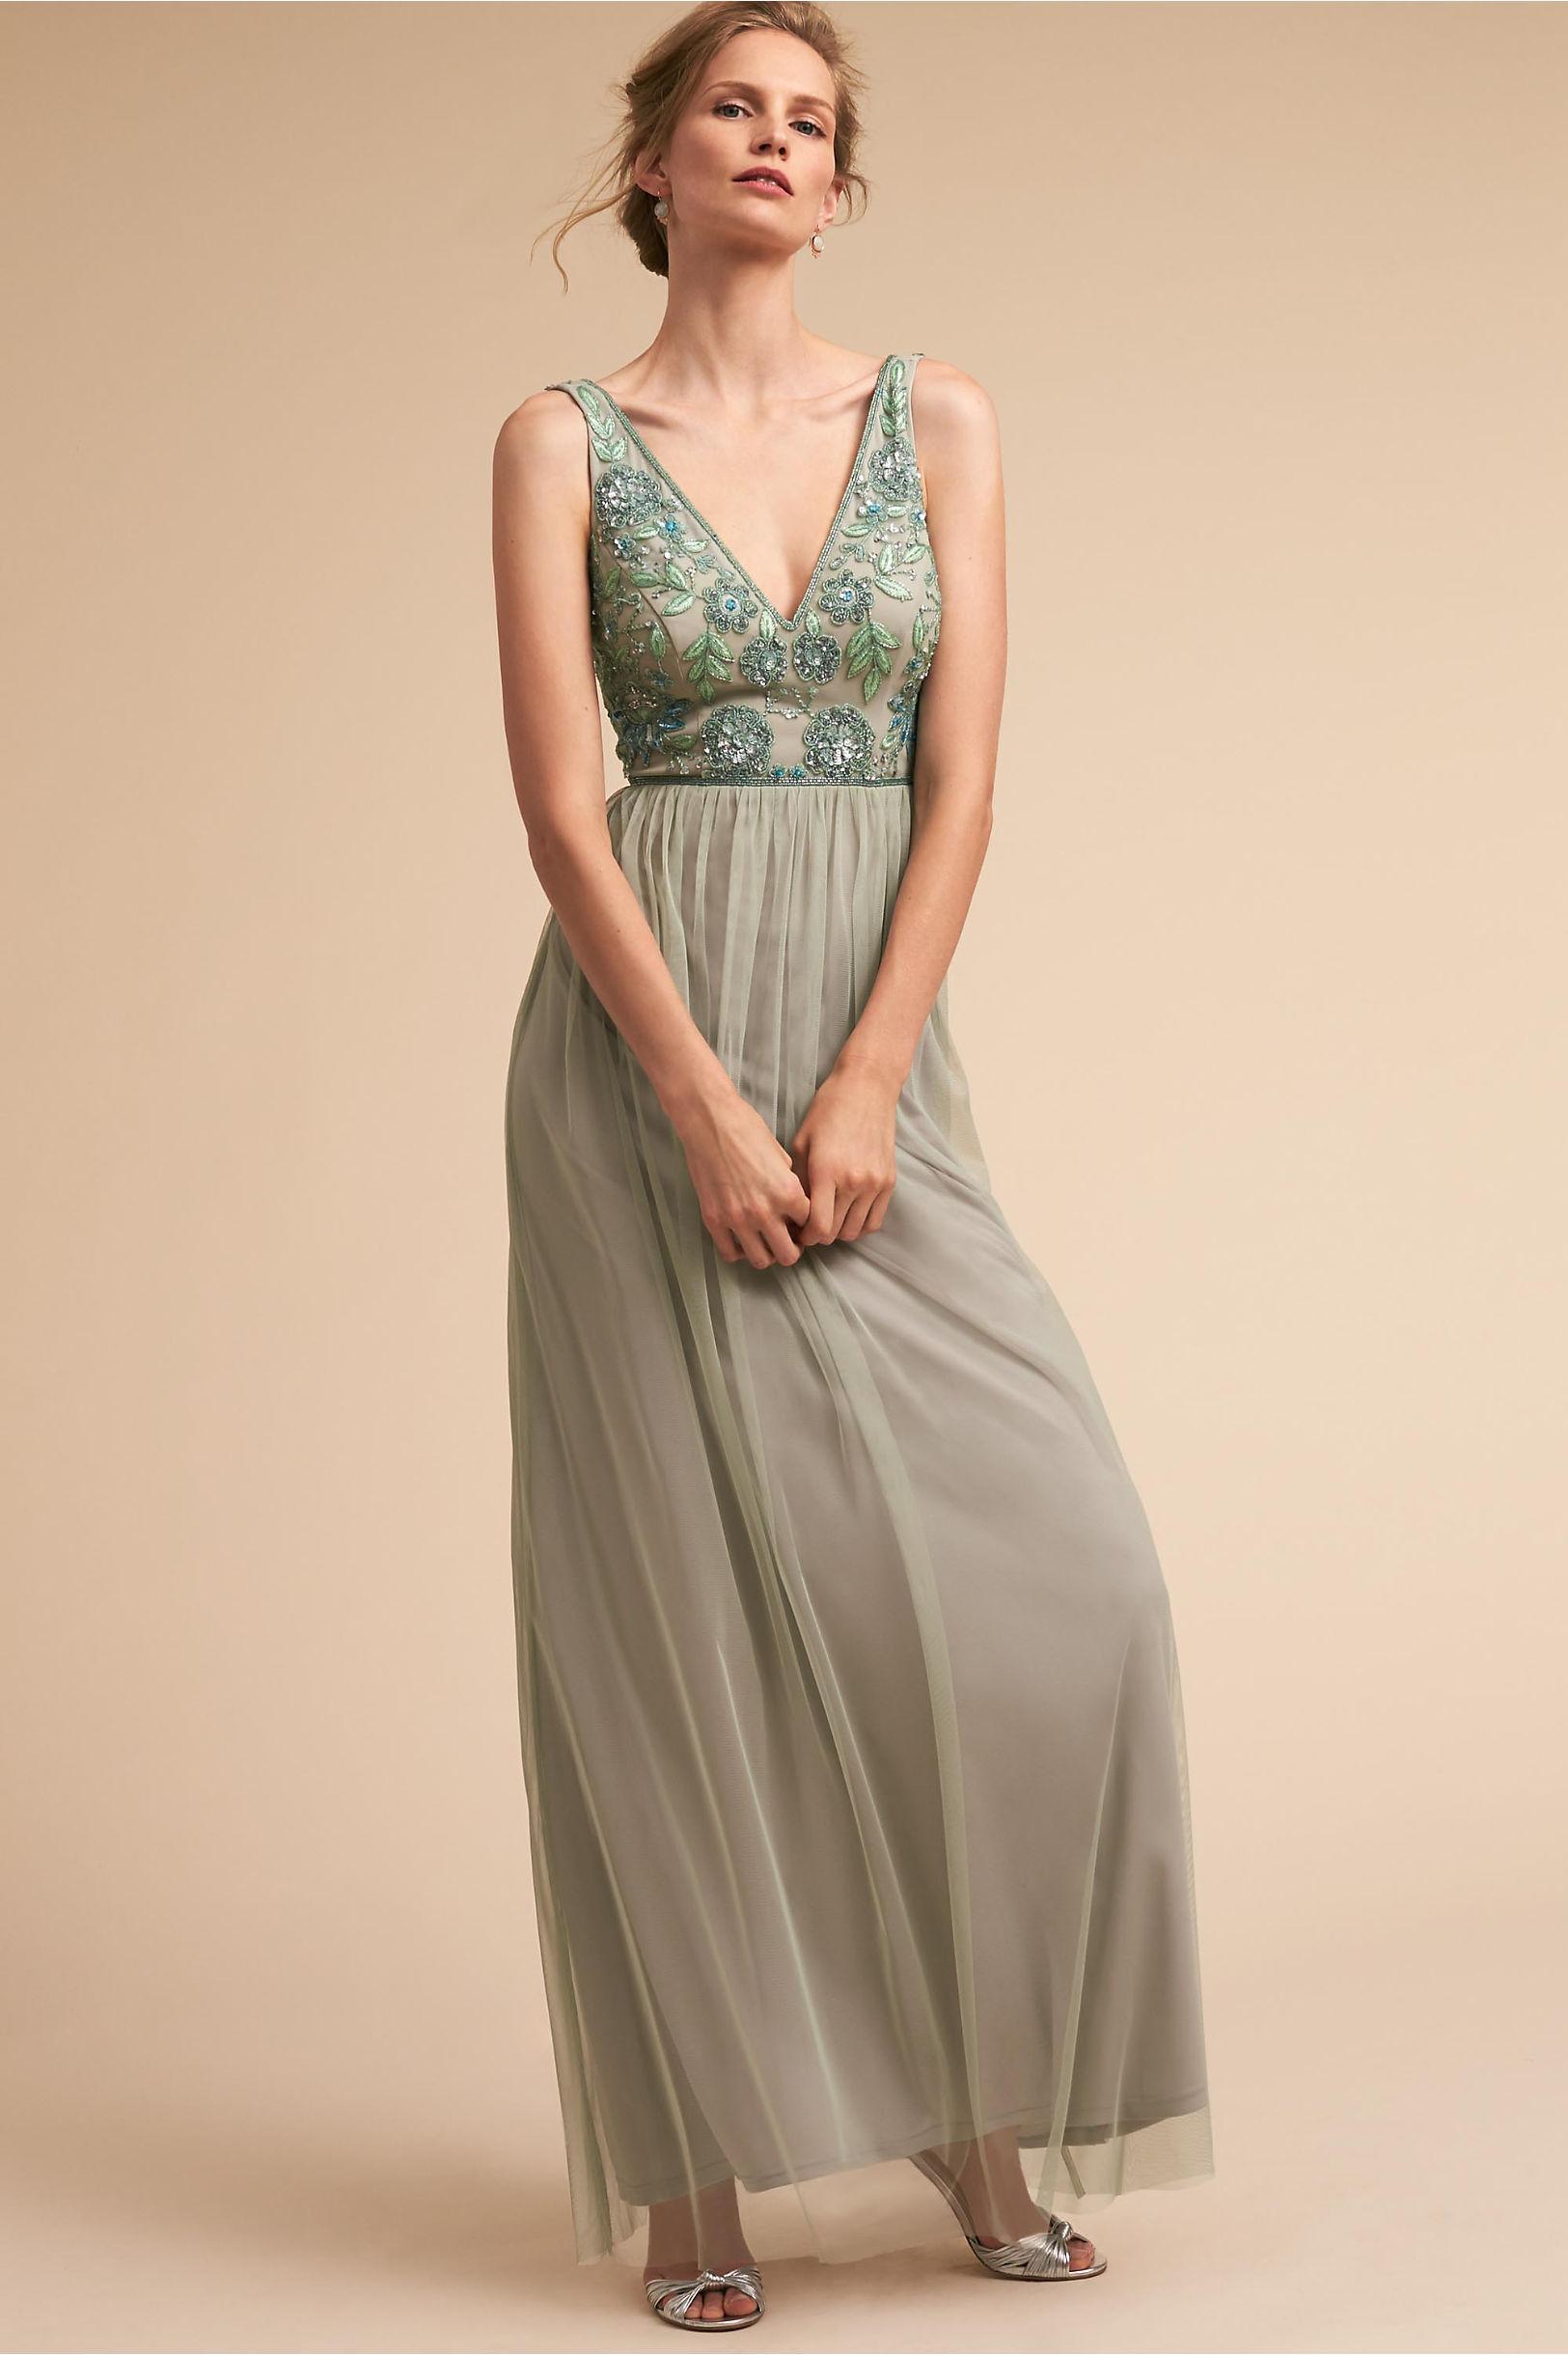 green bridesmaid dresses hibiscus dress ukrnajy